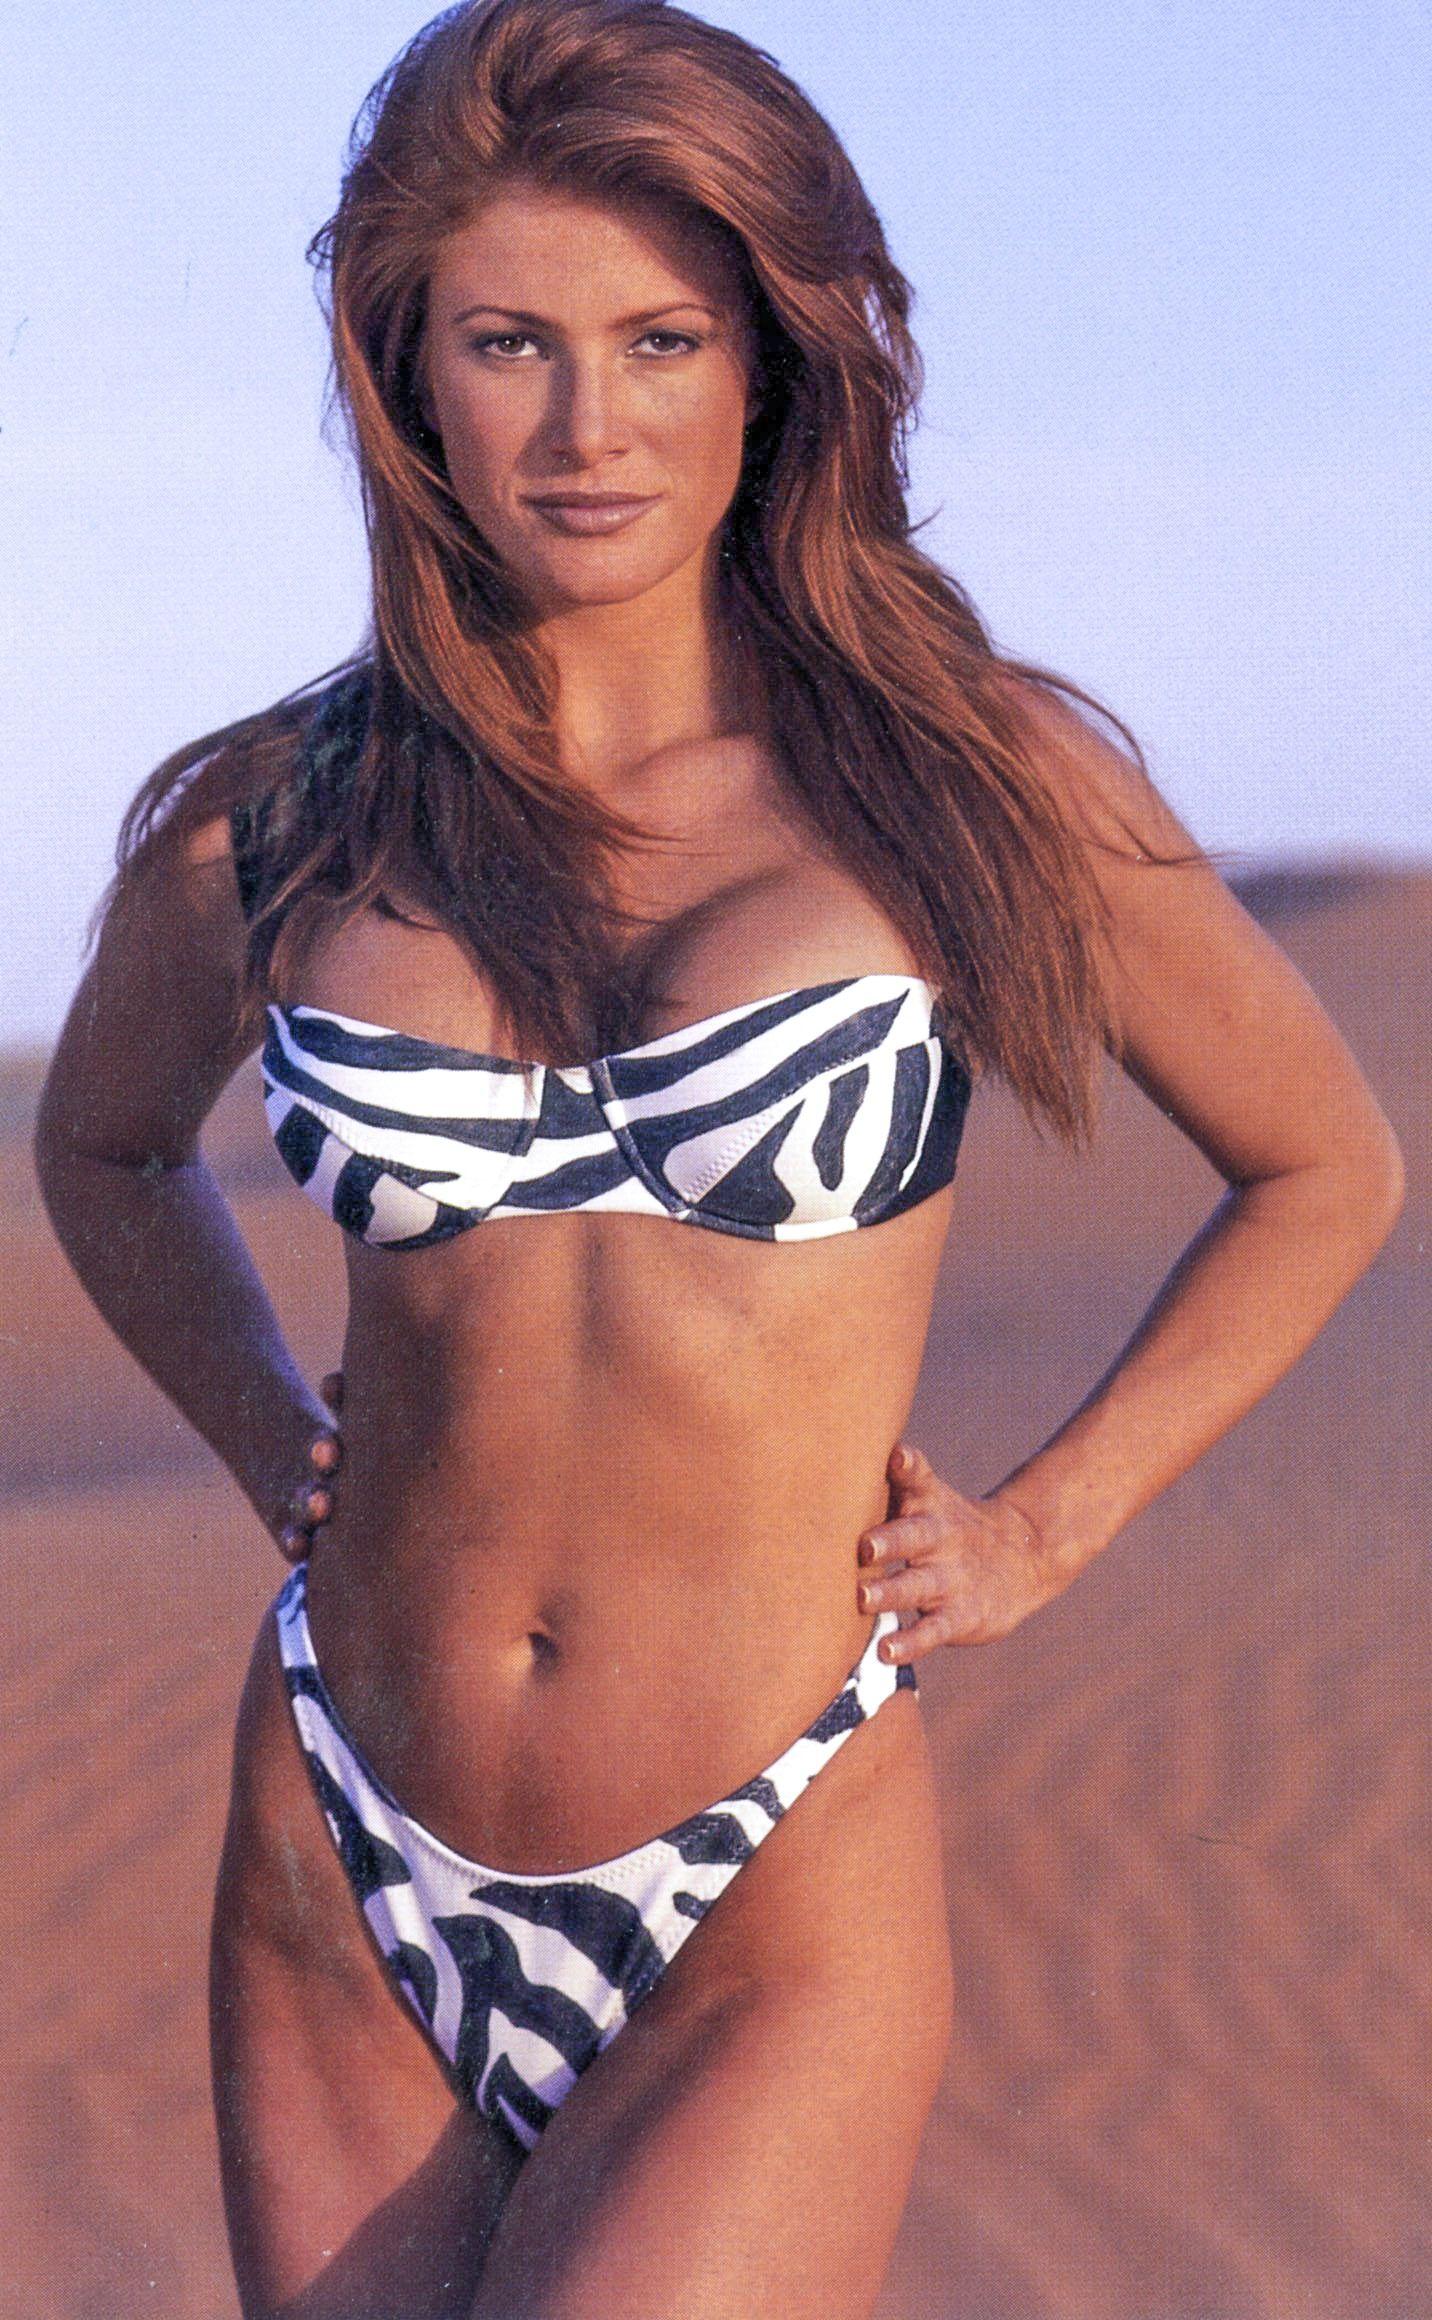 Celebrity Nicolle Radzivil nudes (99 photo), Topless, Sideboobs, Feet, braless 2020